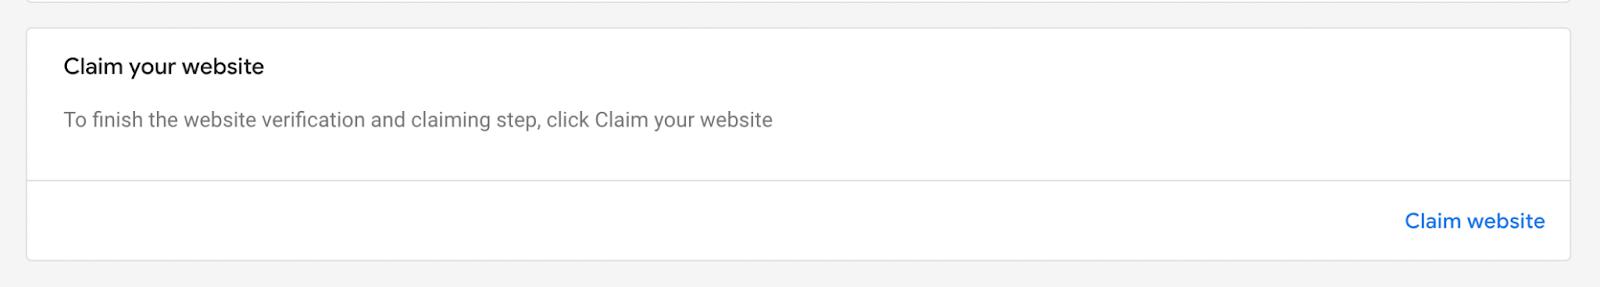 Claim your website